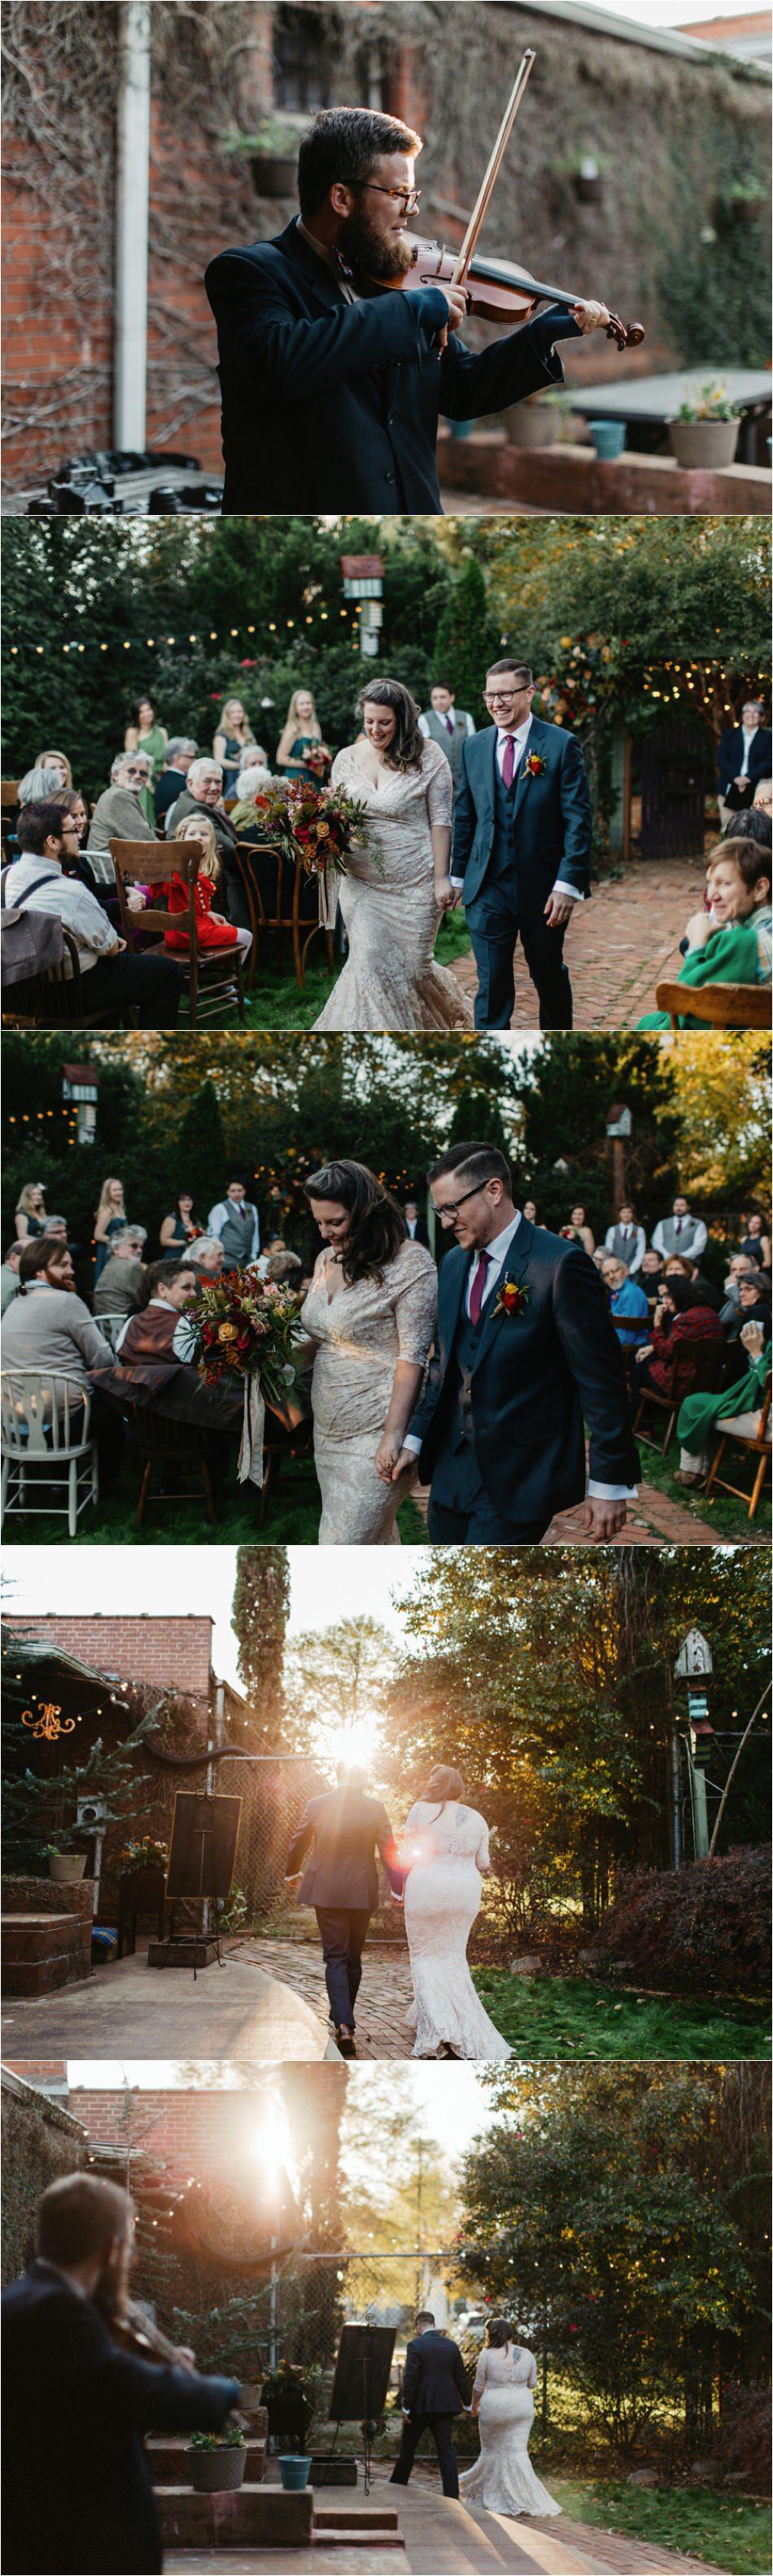 art-bomb-greenville-sc-wedding-photographers69.jpg